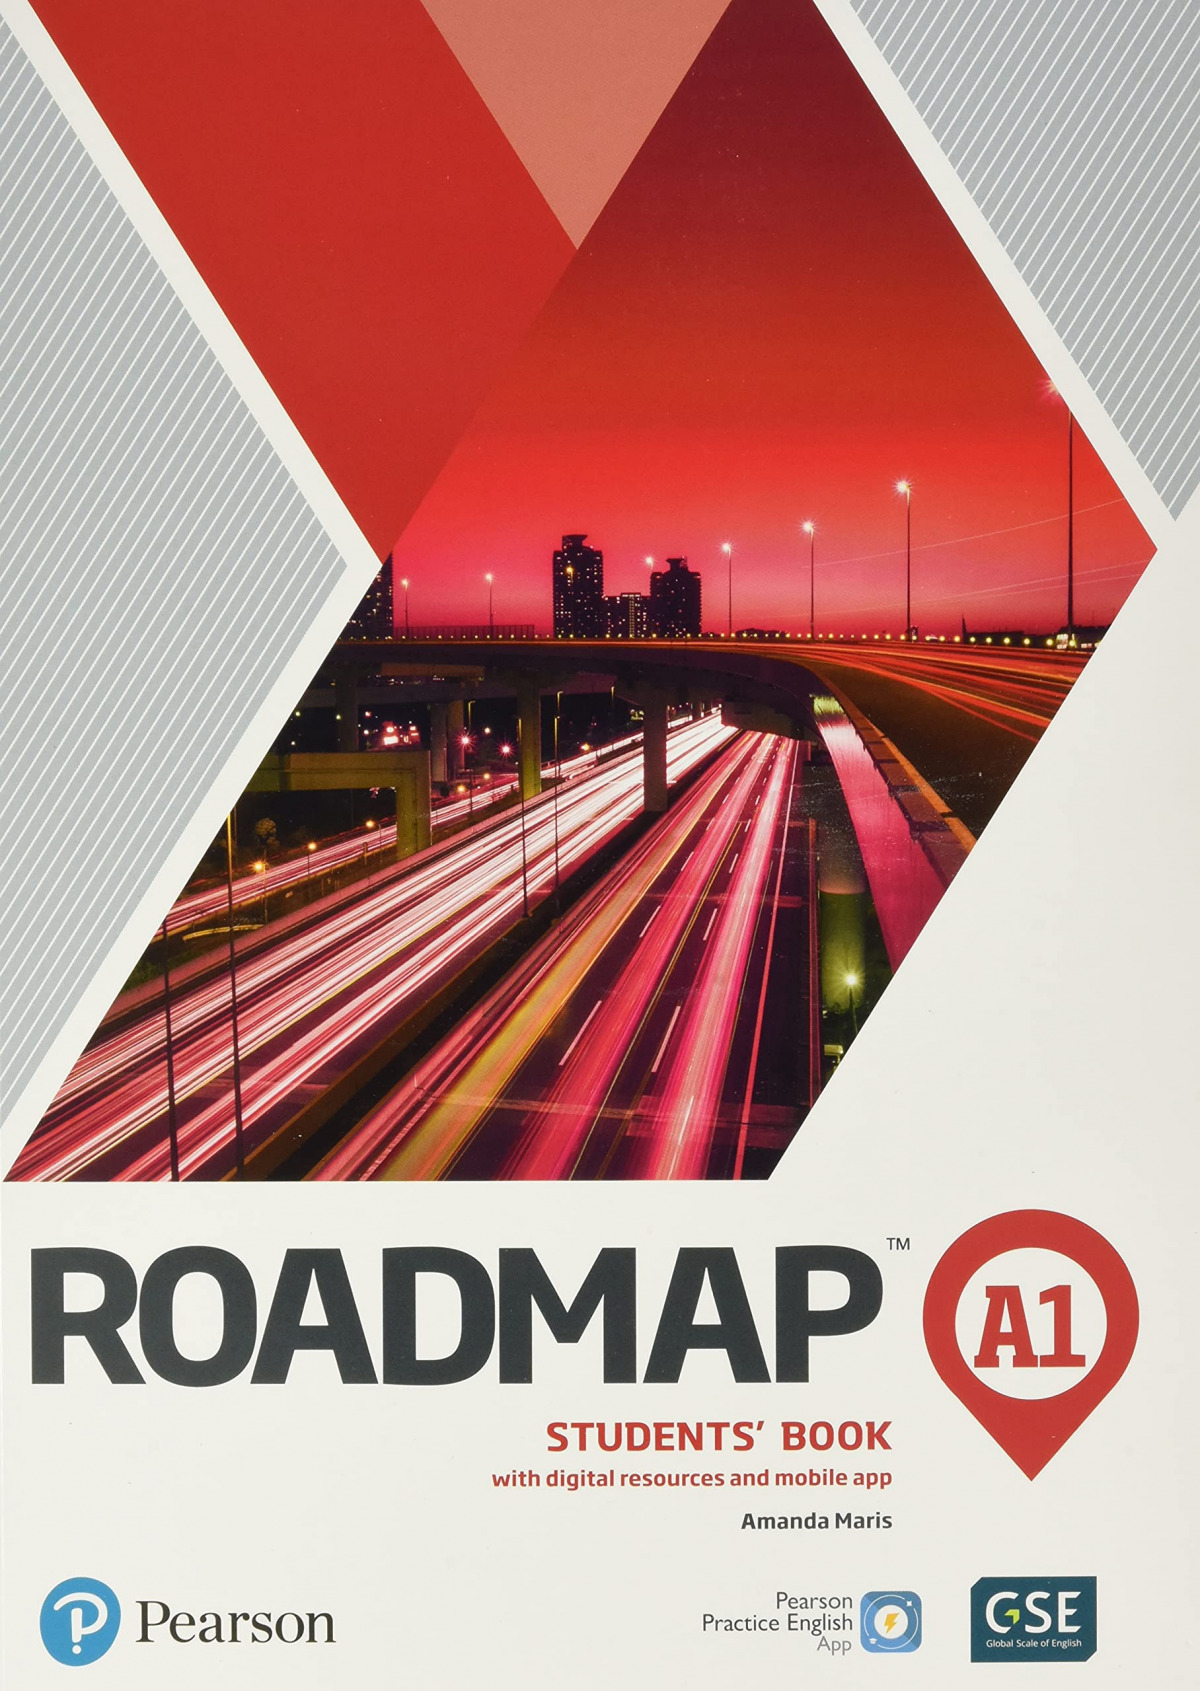 RoadMap A1 Students' Book